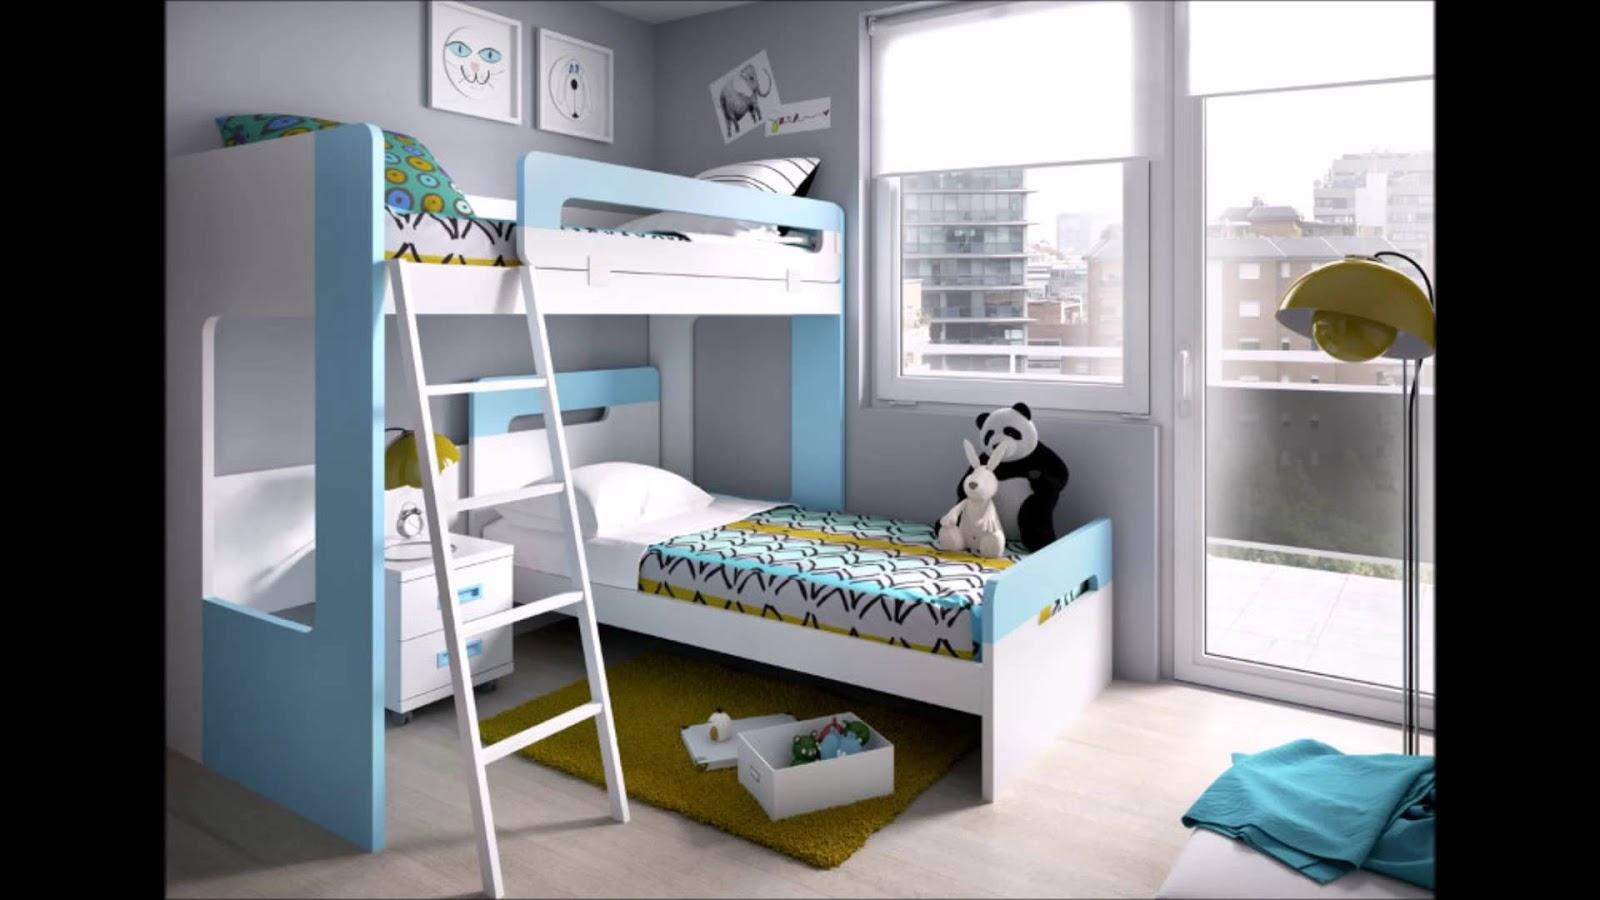 Apuntes revista digital de arquitectura mobiliario de for Camas infantiles diseno moderno